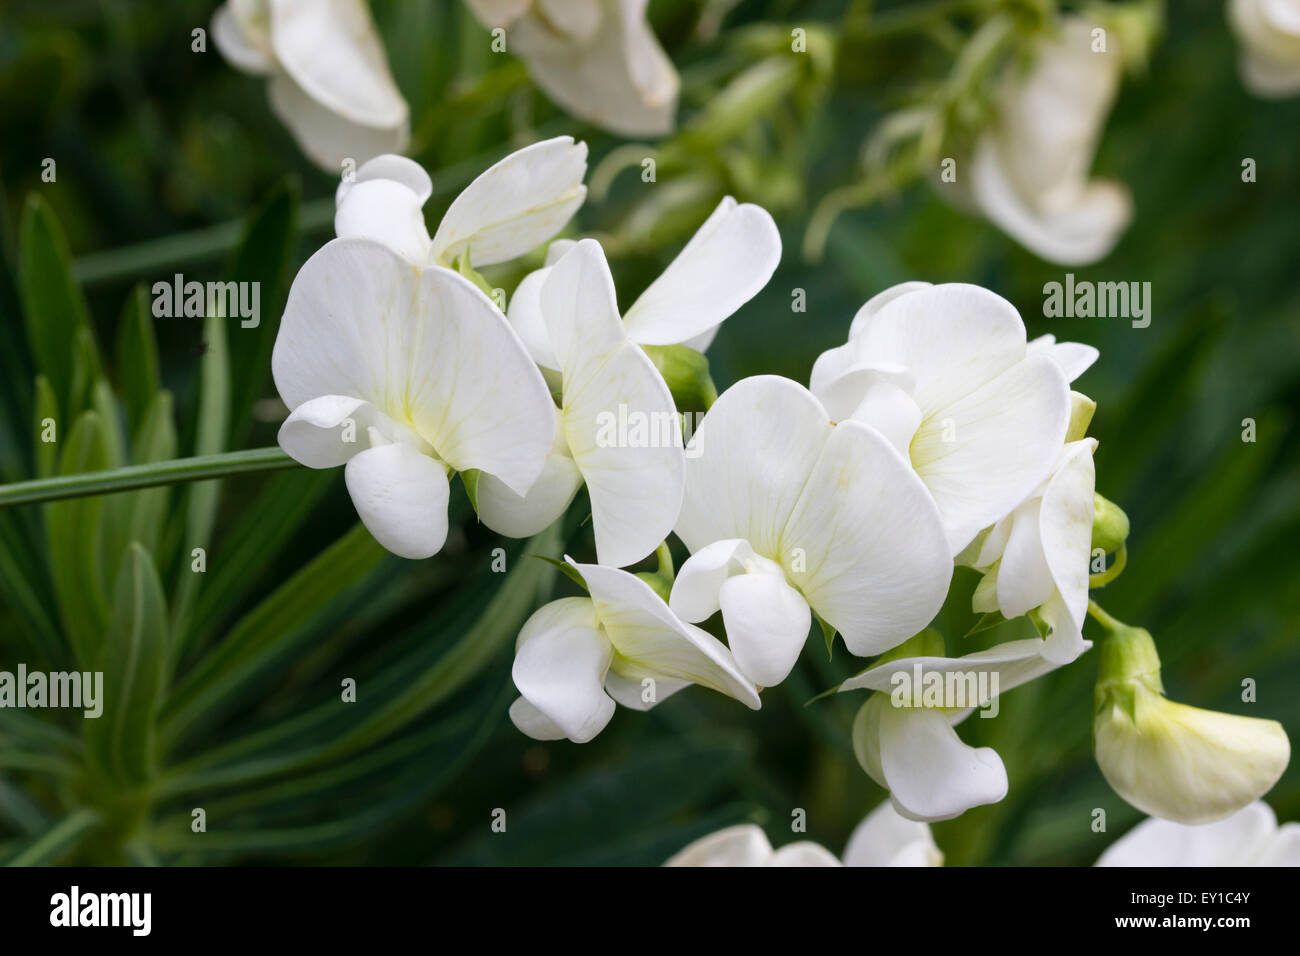 Pure White Flowers Fo The Perennial Climbing Pea Lathyrus